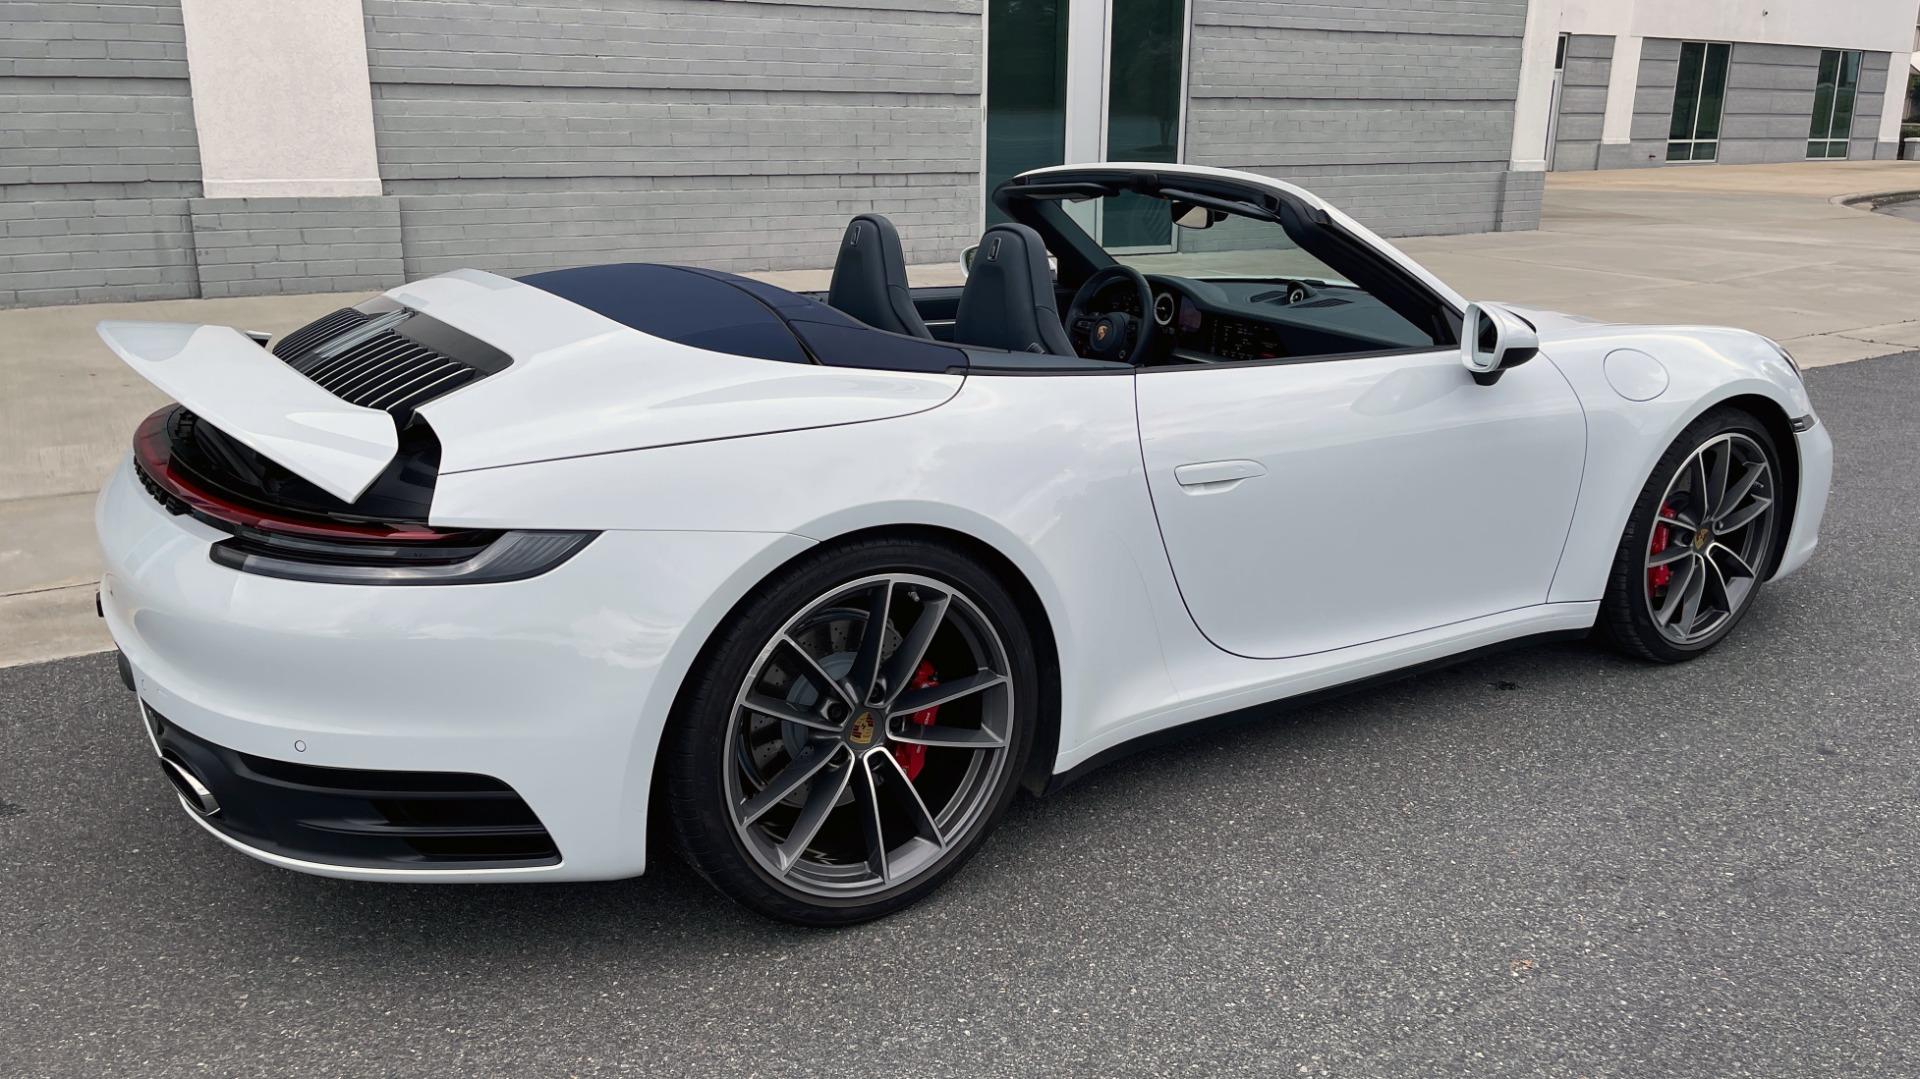 Used 2020 Porsche 911 CARRERA 4S CABRIOLET PREMIUM SPORT PKG / NAV / BOSE / LIGHT DESIGN PKG for sale $167,595 at Formula Imports in Charlotte NC 28227 5